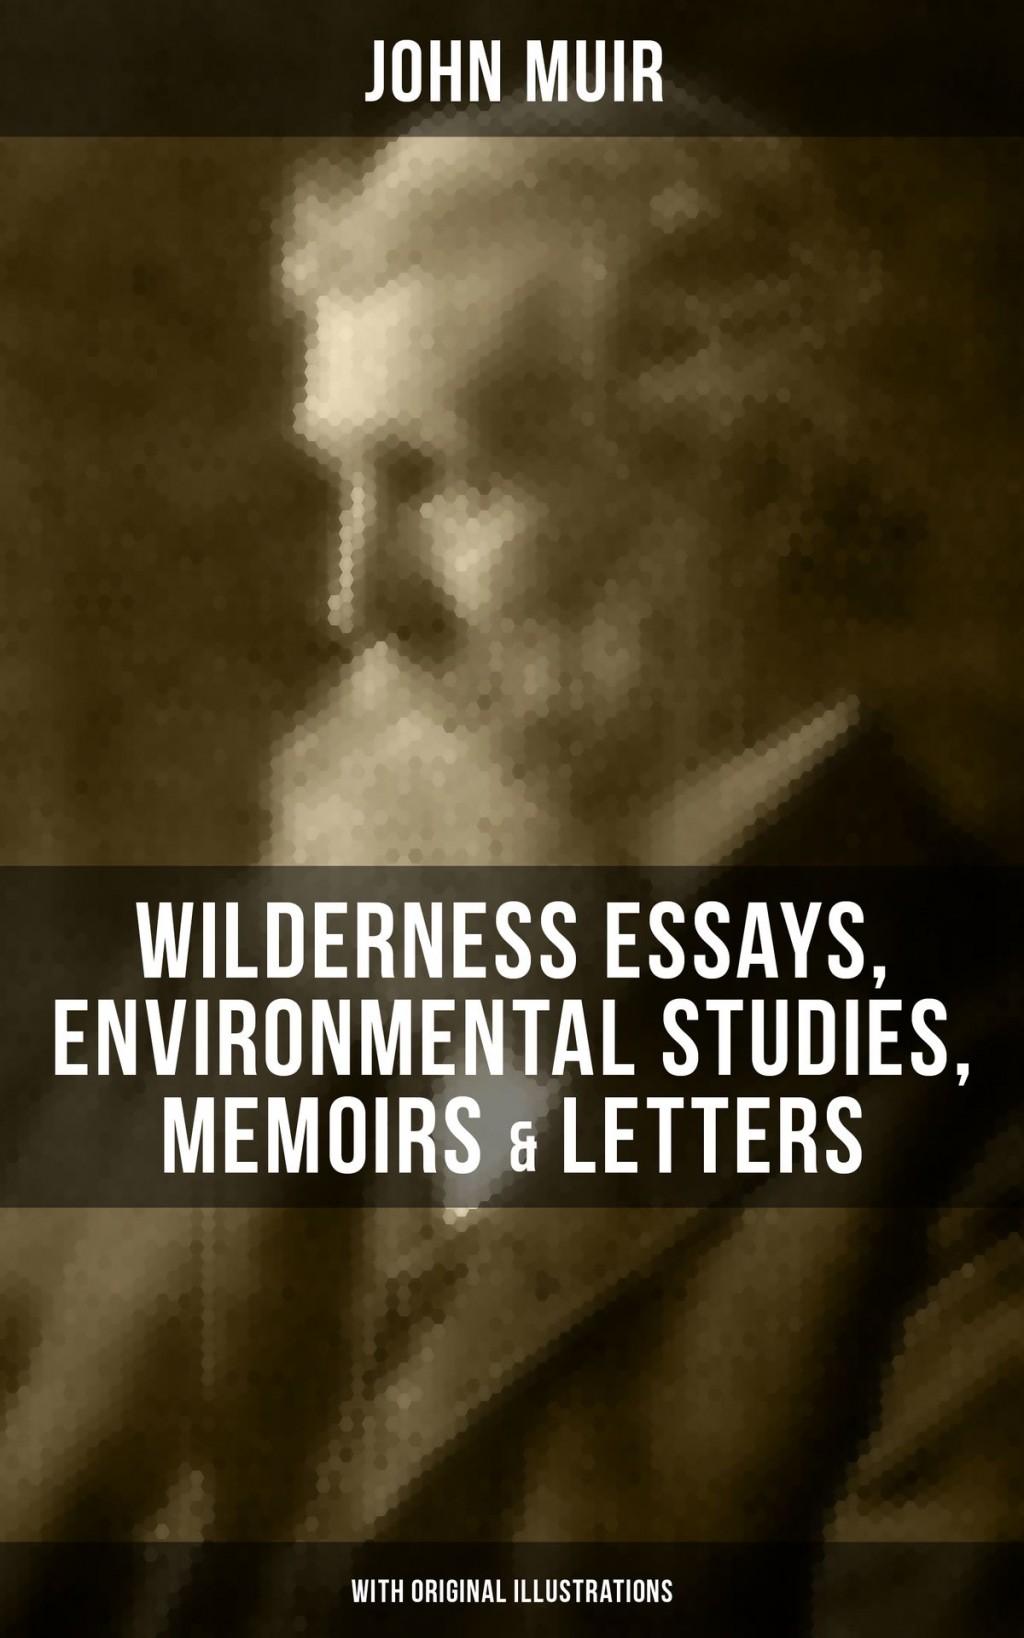 016 Essay Example John Muir Wilderness Essays Environmental Studies Memoirs Letters With Original Best Pdf Review Large